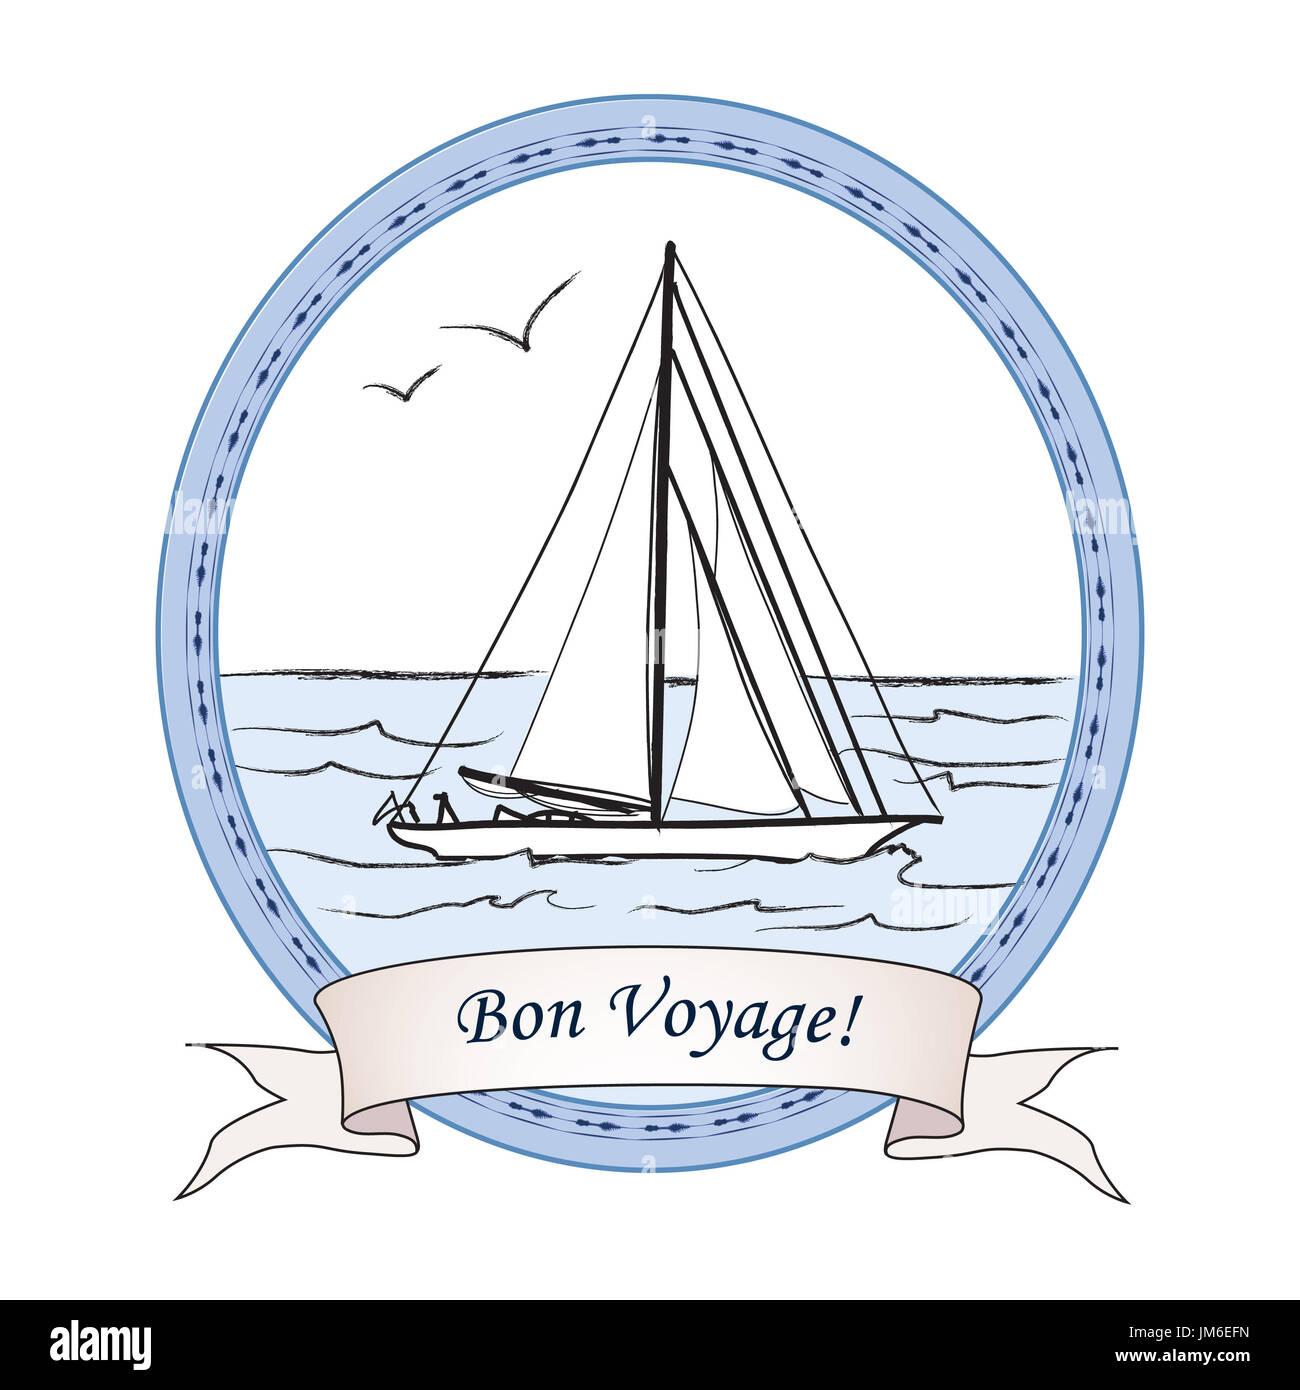 Bon Voyage vintage travel card  Yacht in ocean banner